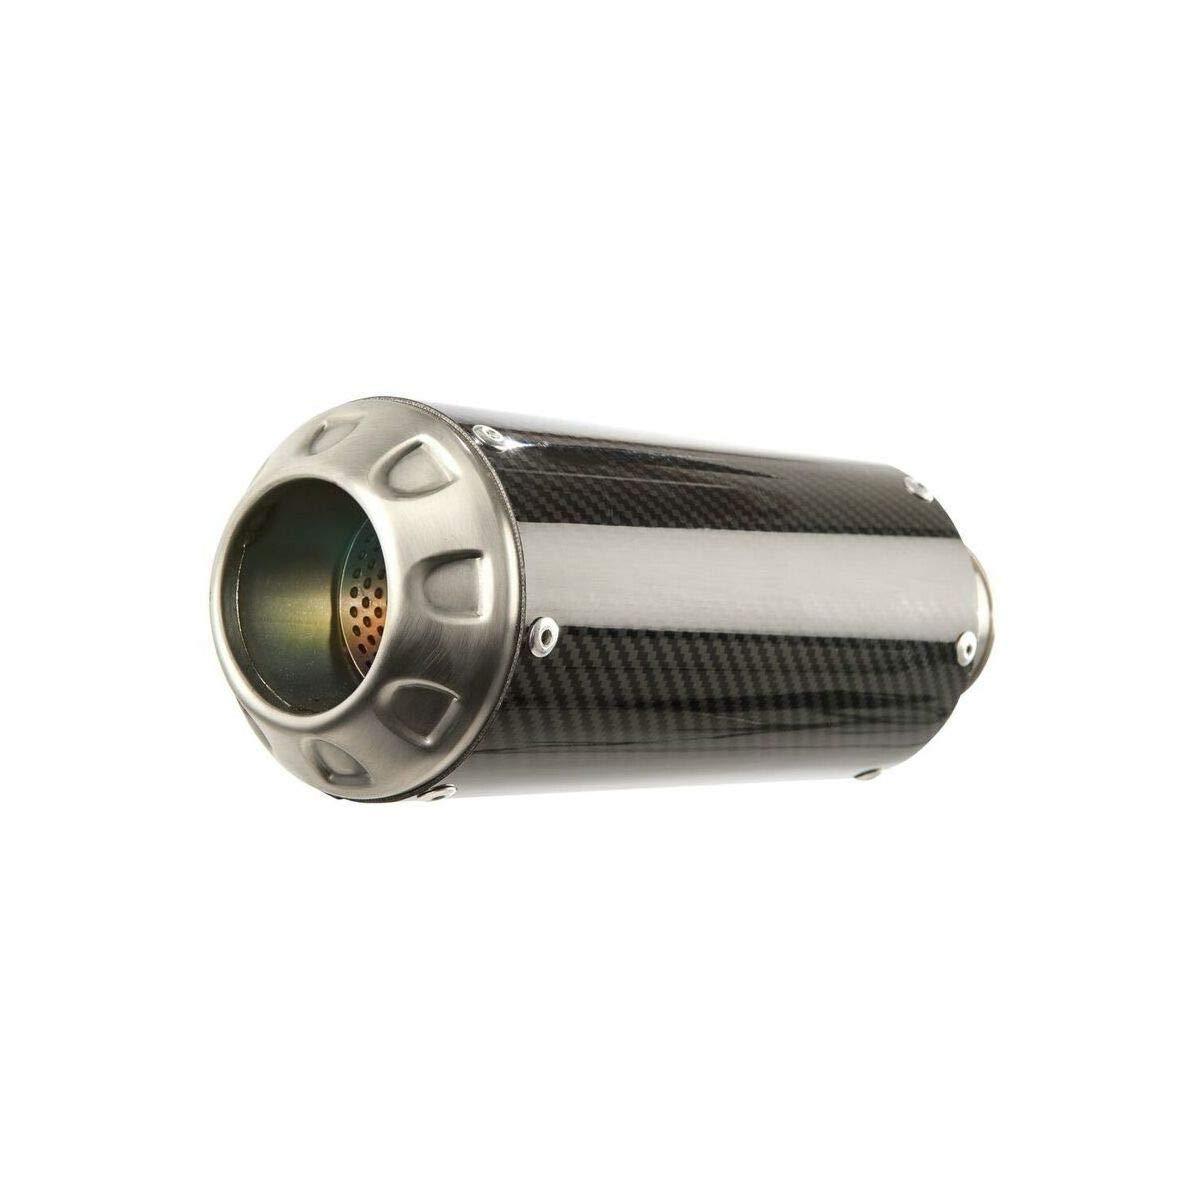 Carbon Fiber with Stainless End Cap Hotbodies Racing 17-18 Suzuki SV650 MGP Growler Slip-On Exhaust